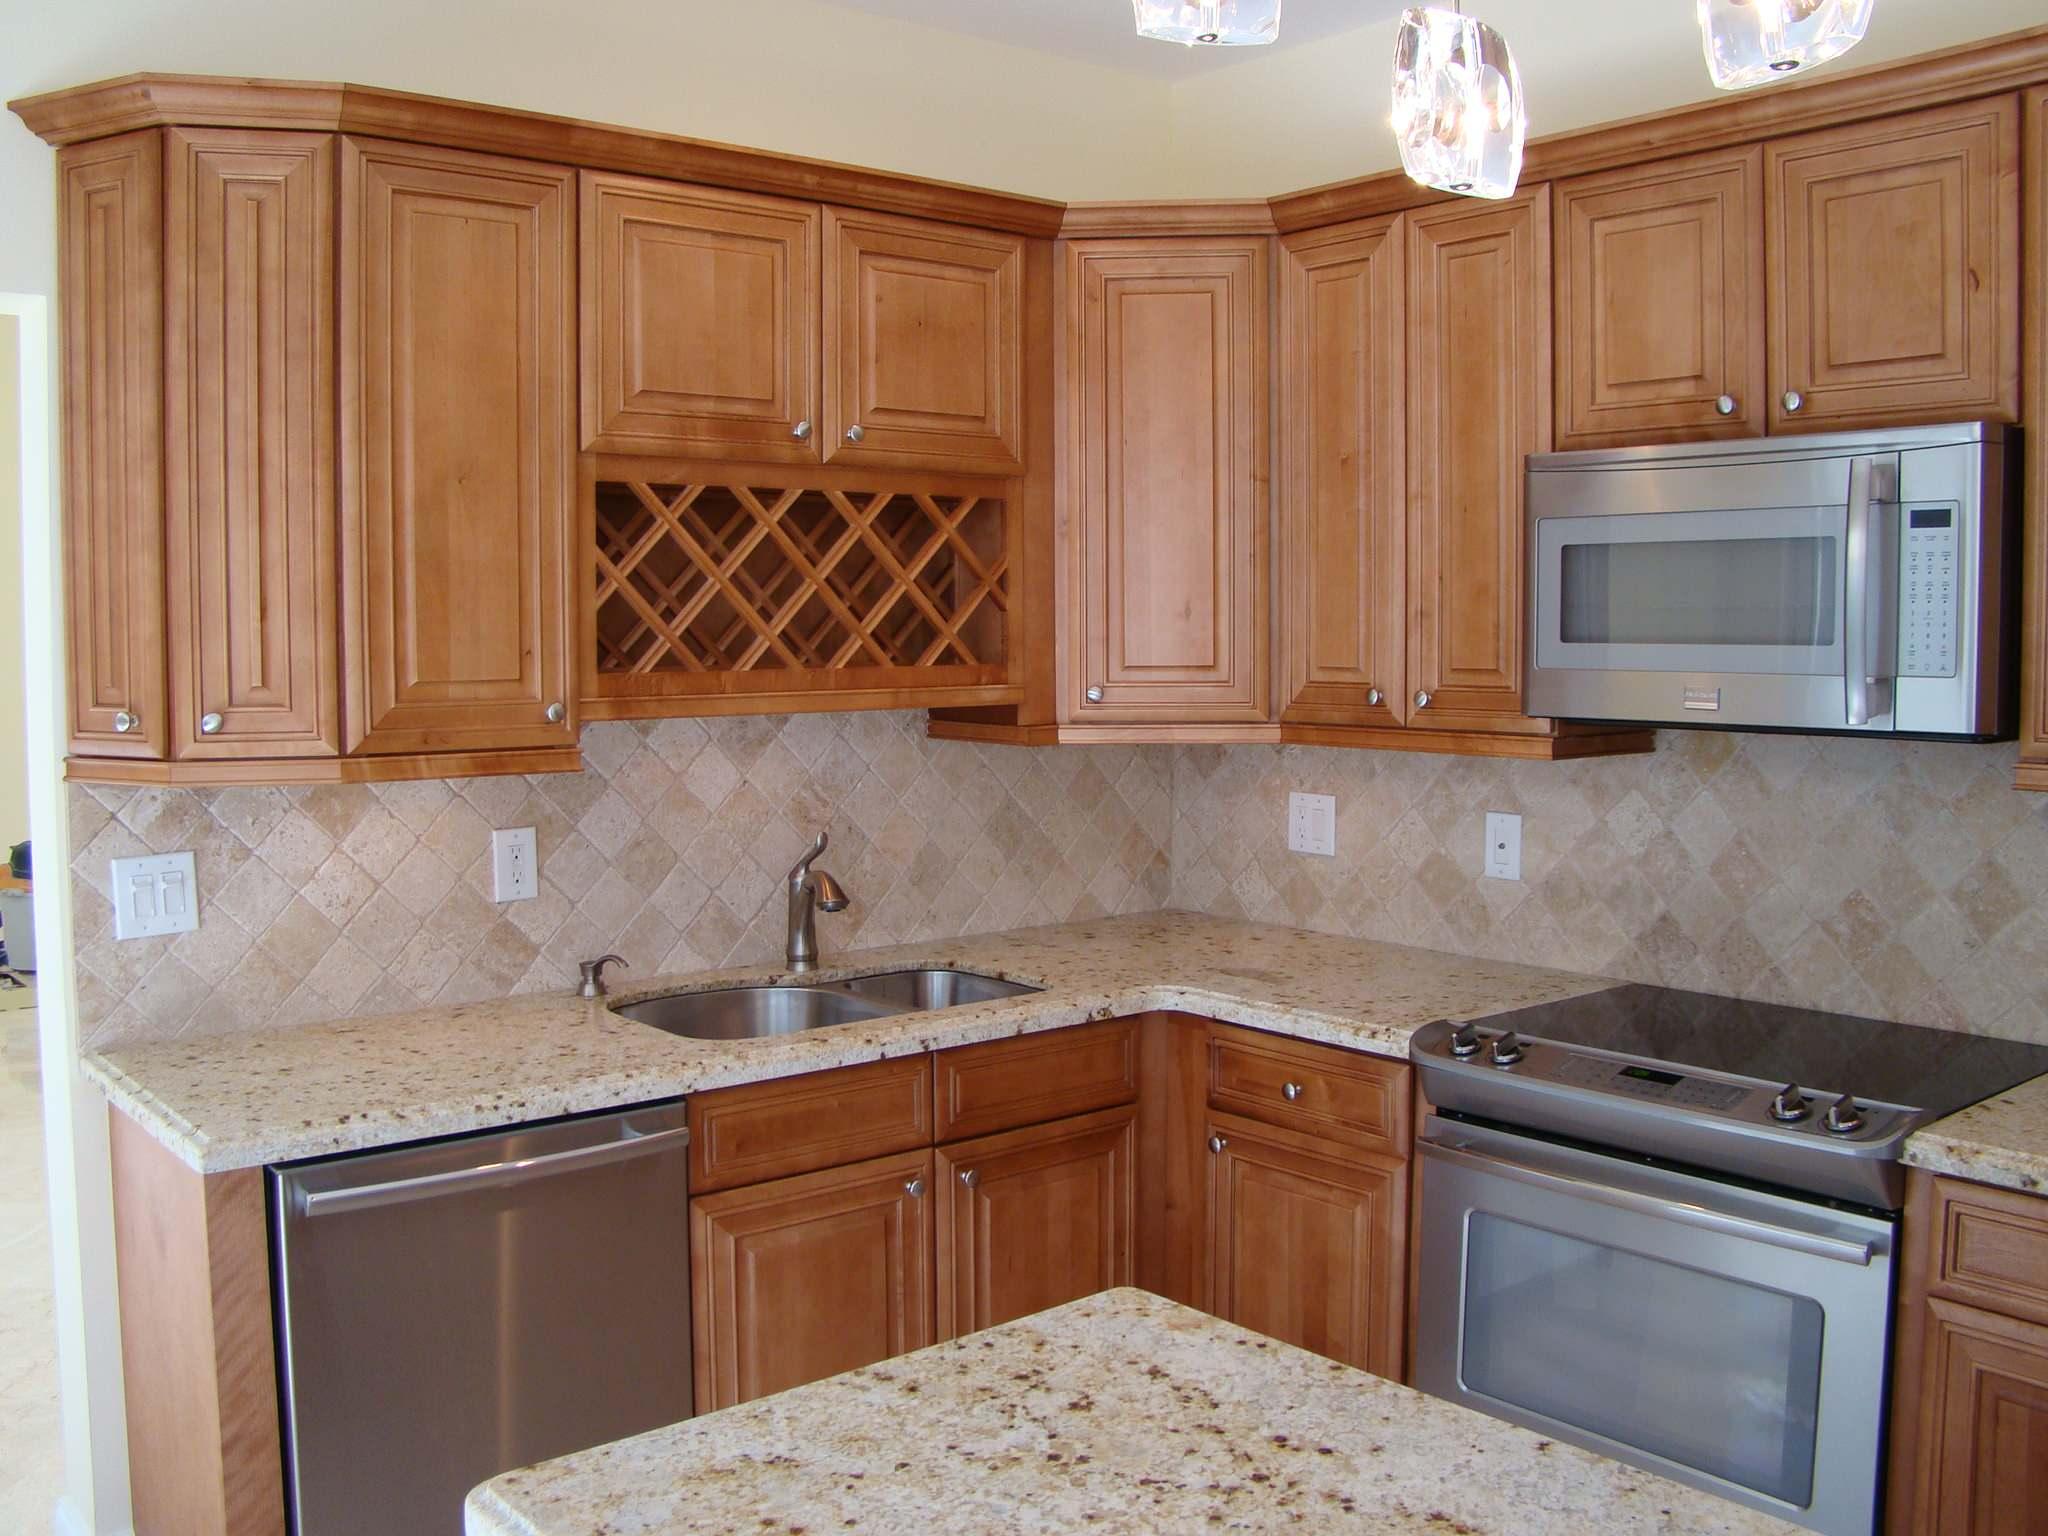 kitchen travertine backsplash tile